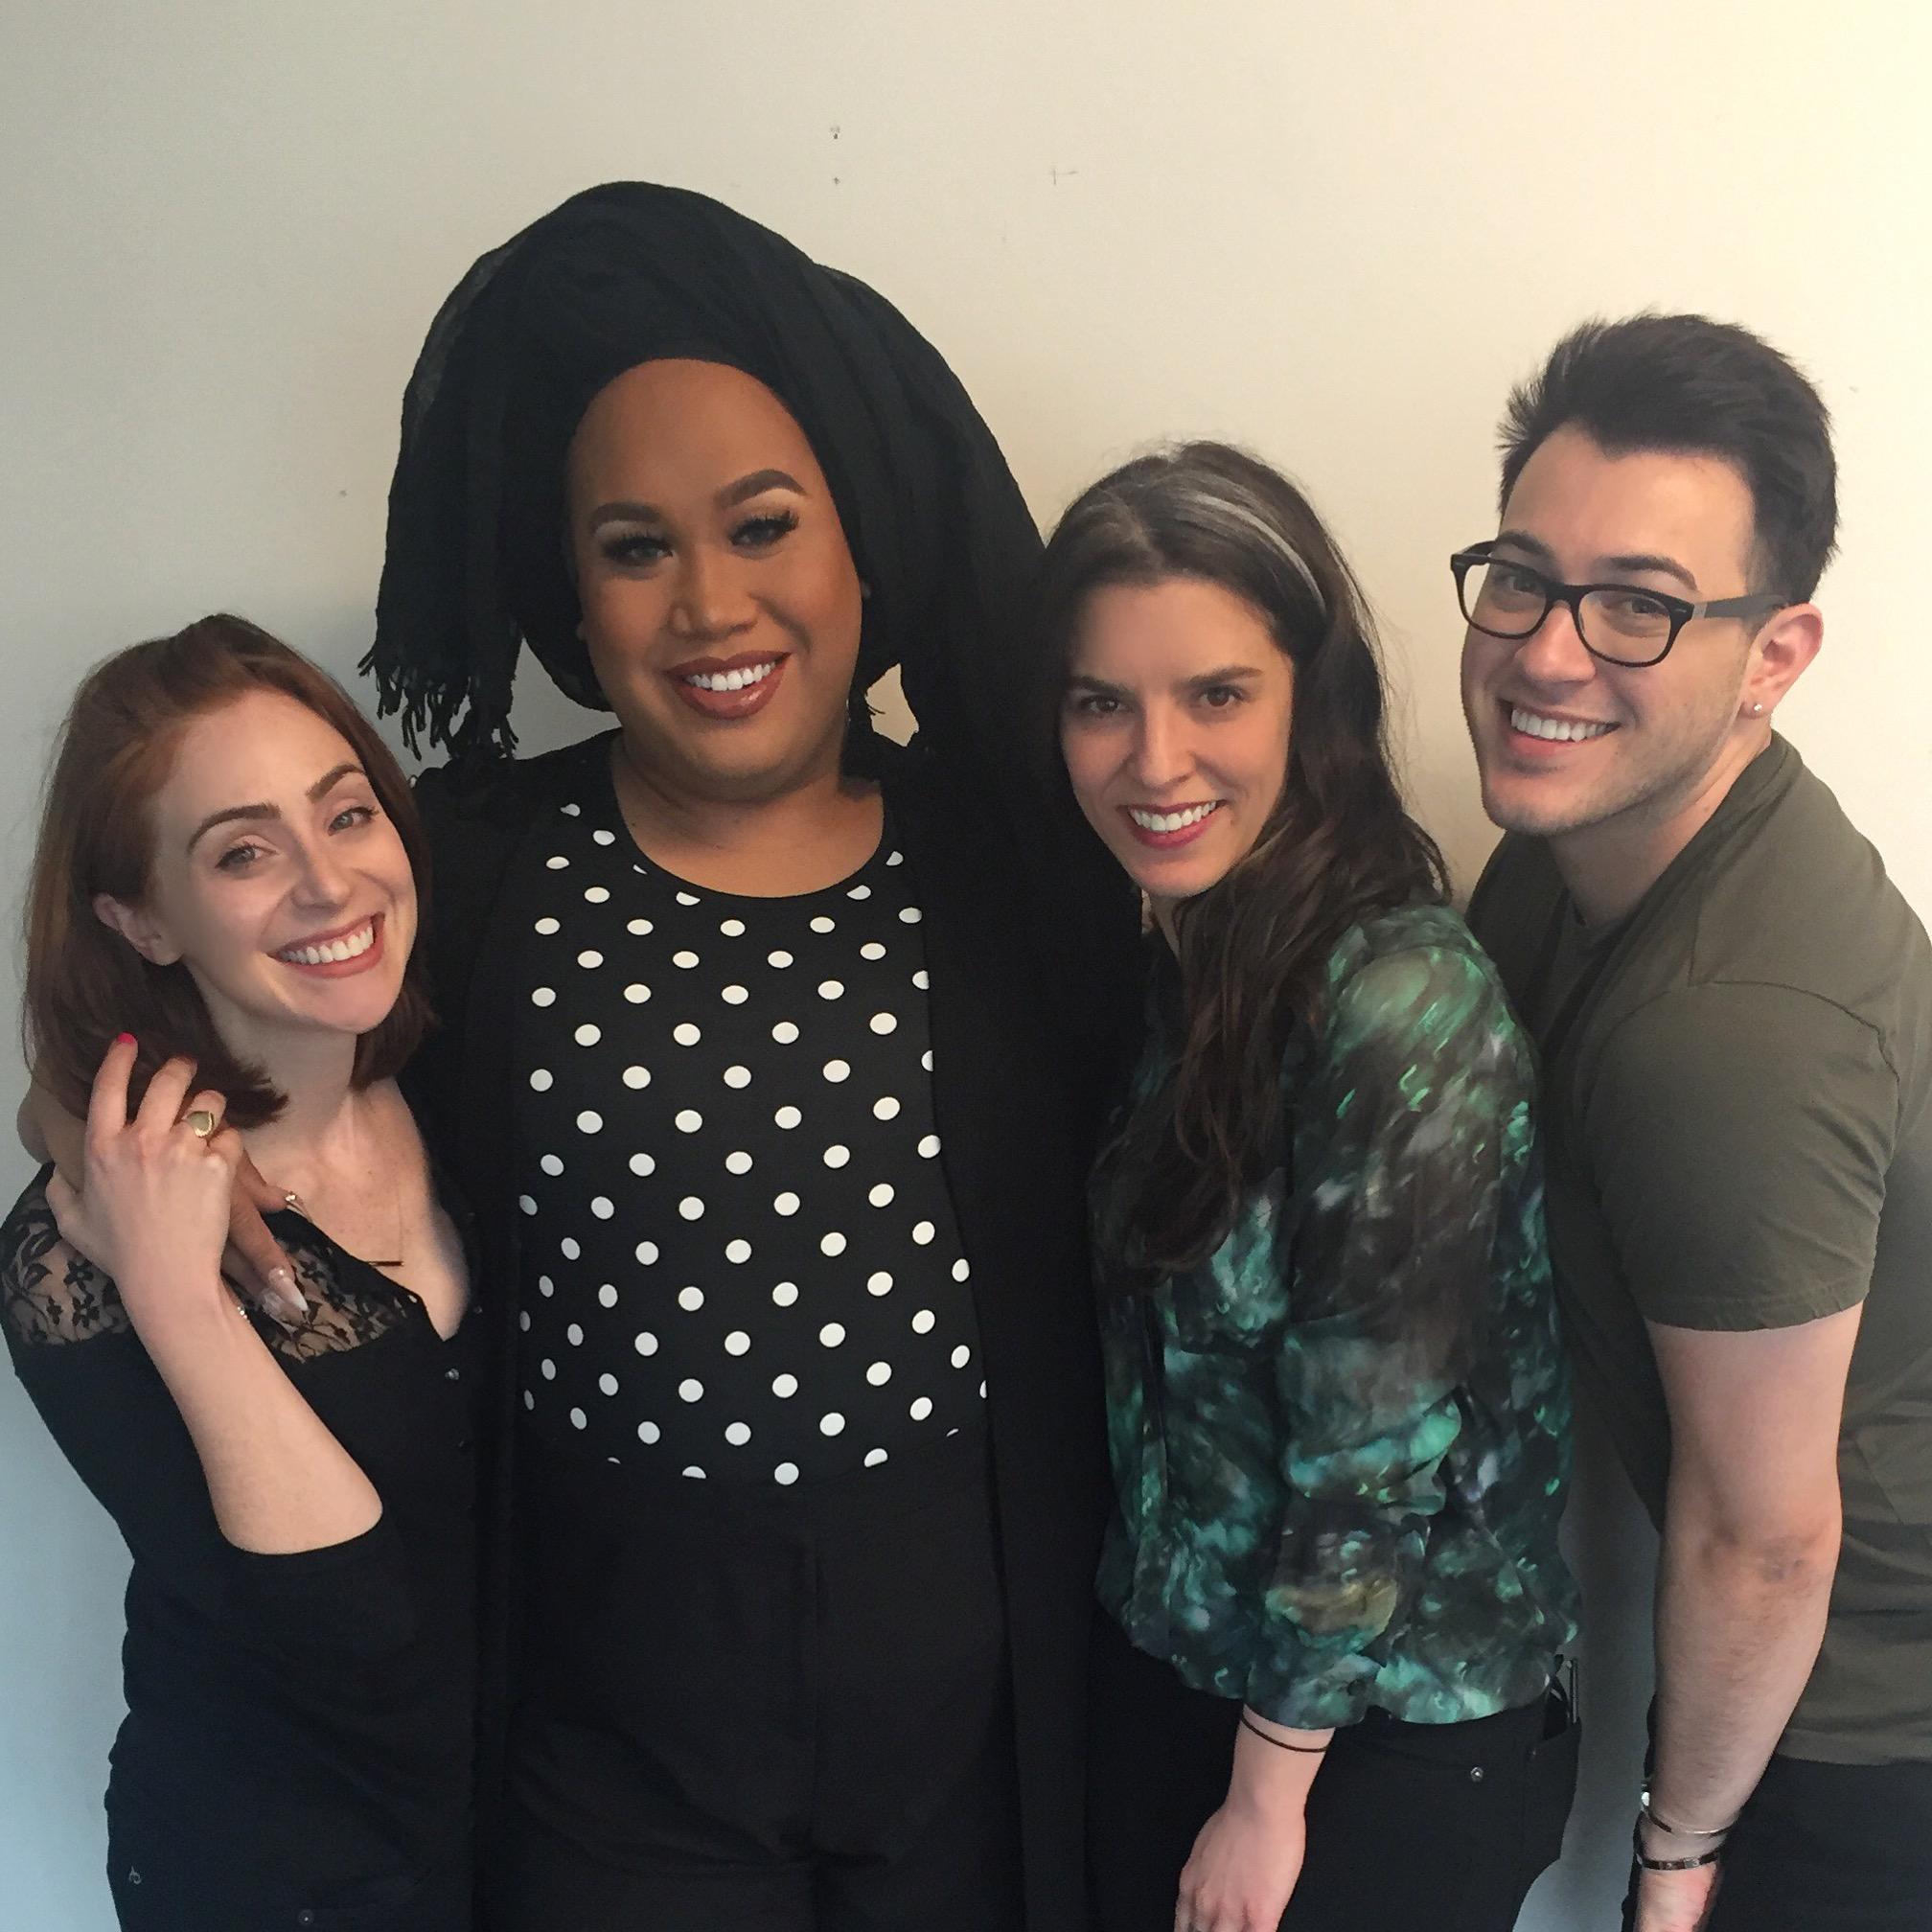 Jess, Patrick, Jenn, and Manny in the Fat Mascara studio